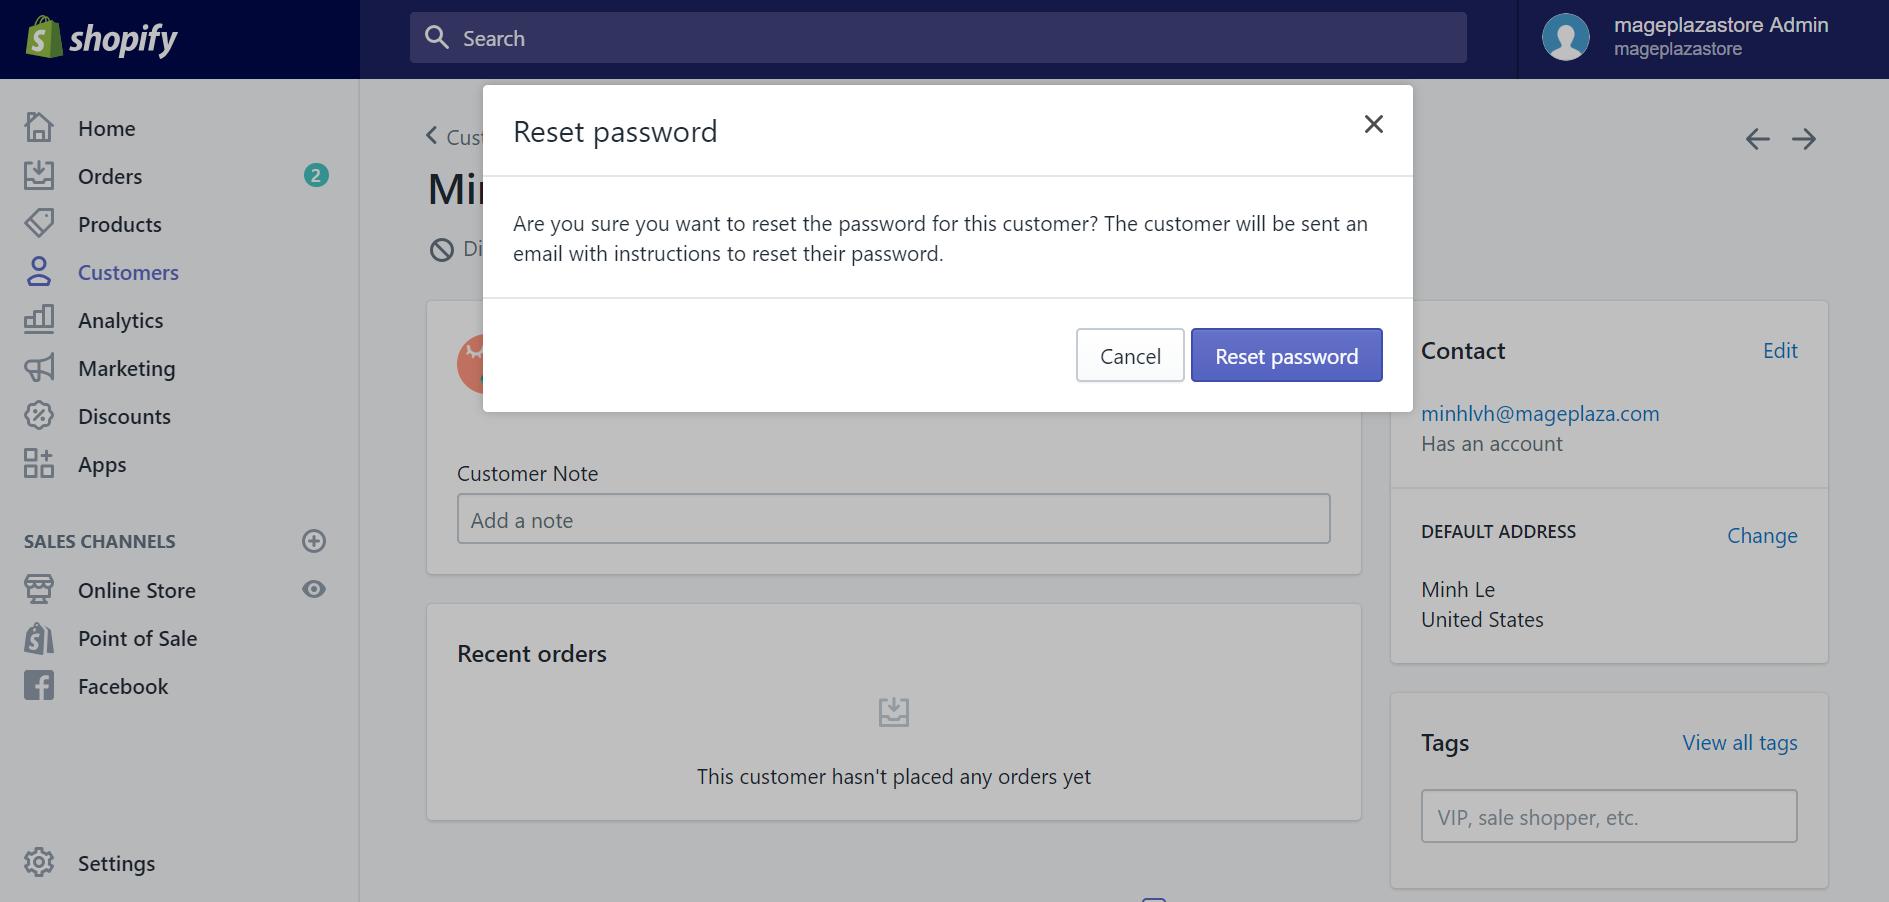 How to reset your customers' passwords